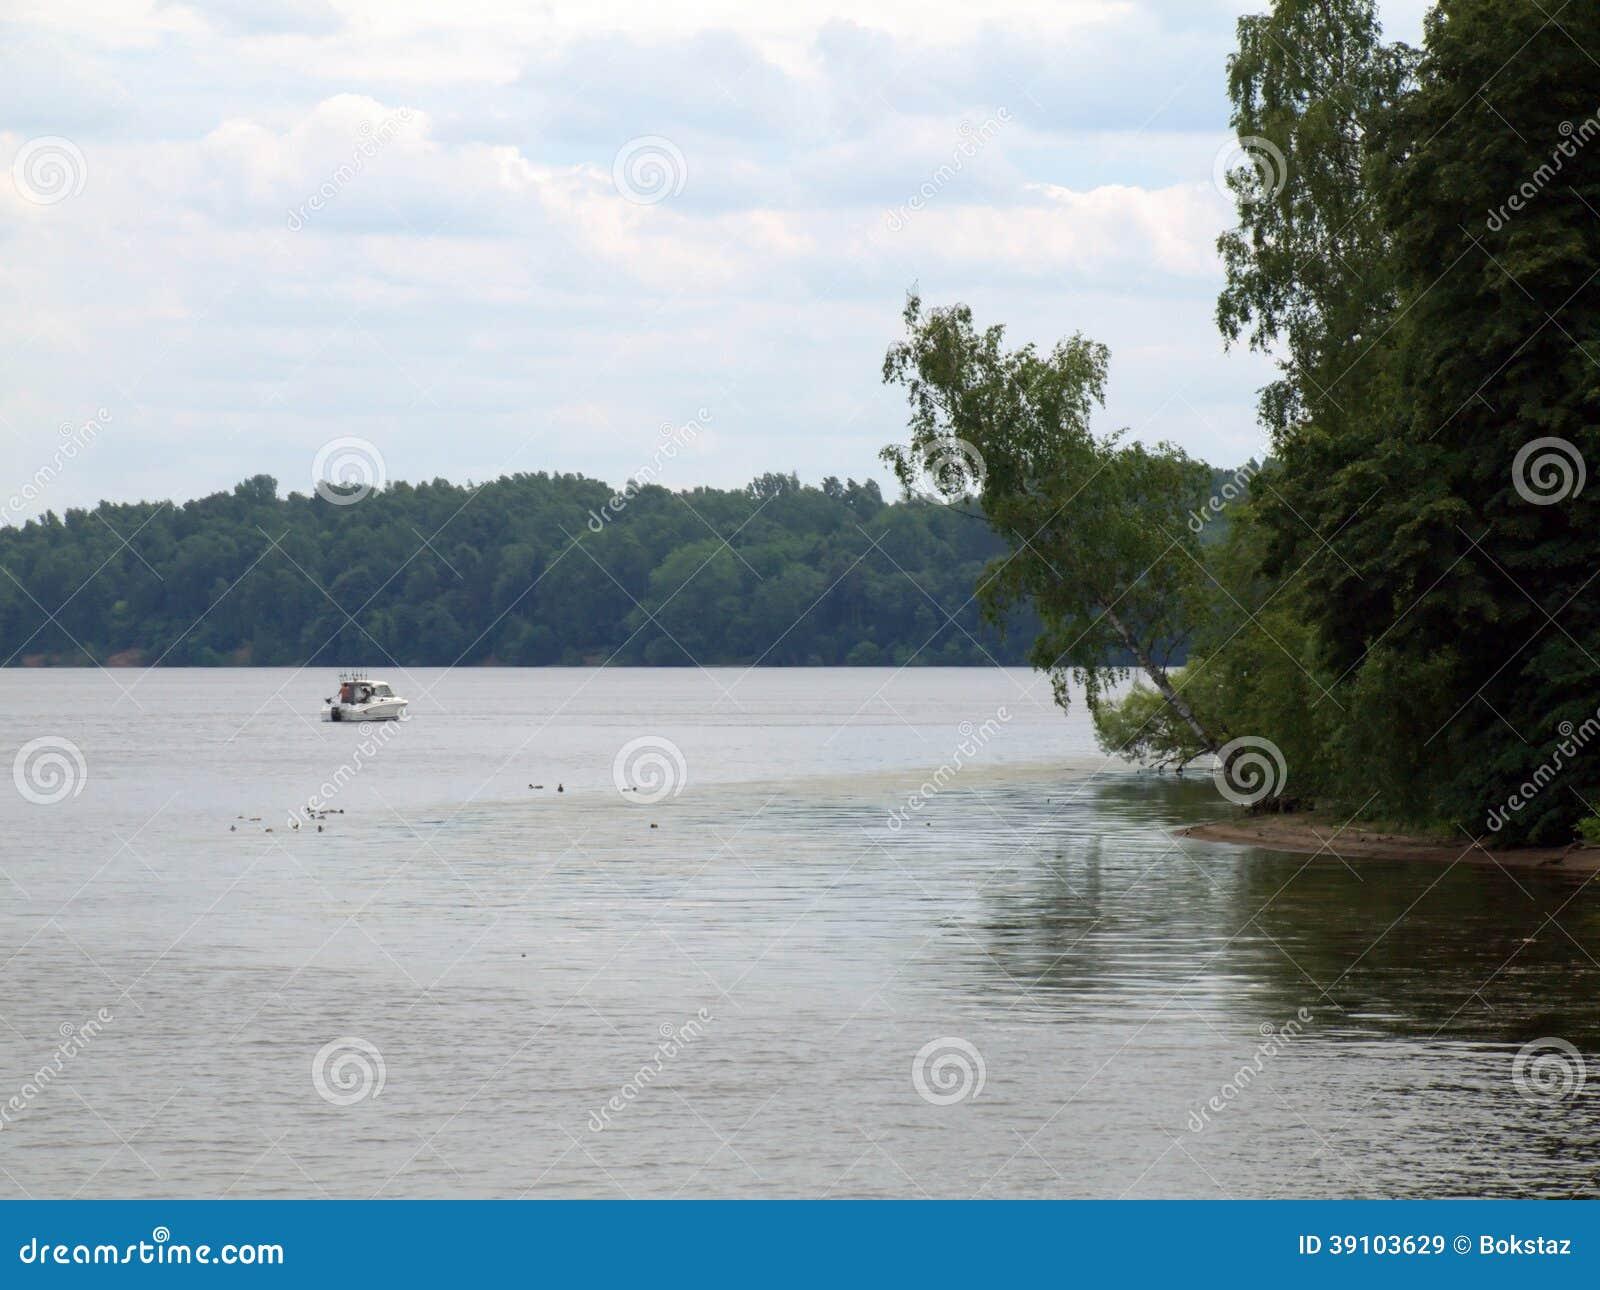 Kaunas kunstmatige overzees - Nemunas-rivierwaterkering